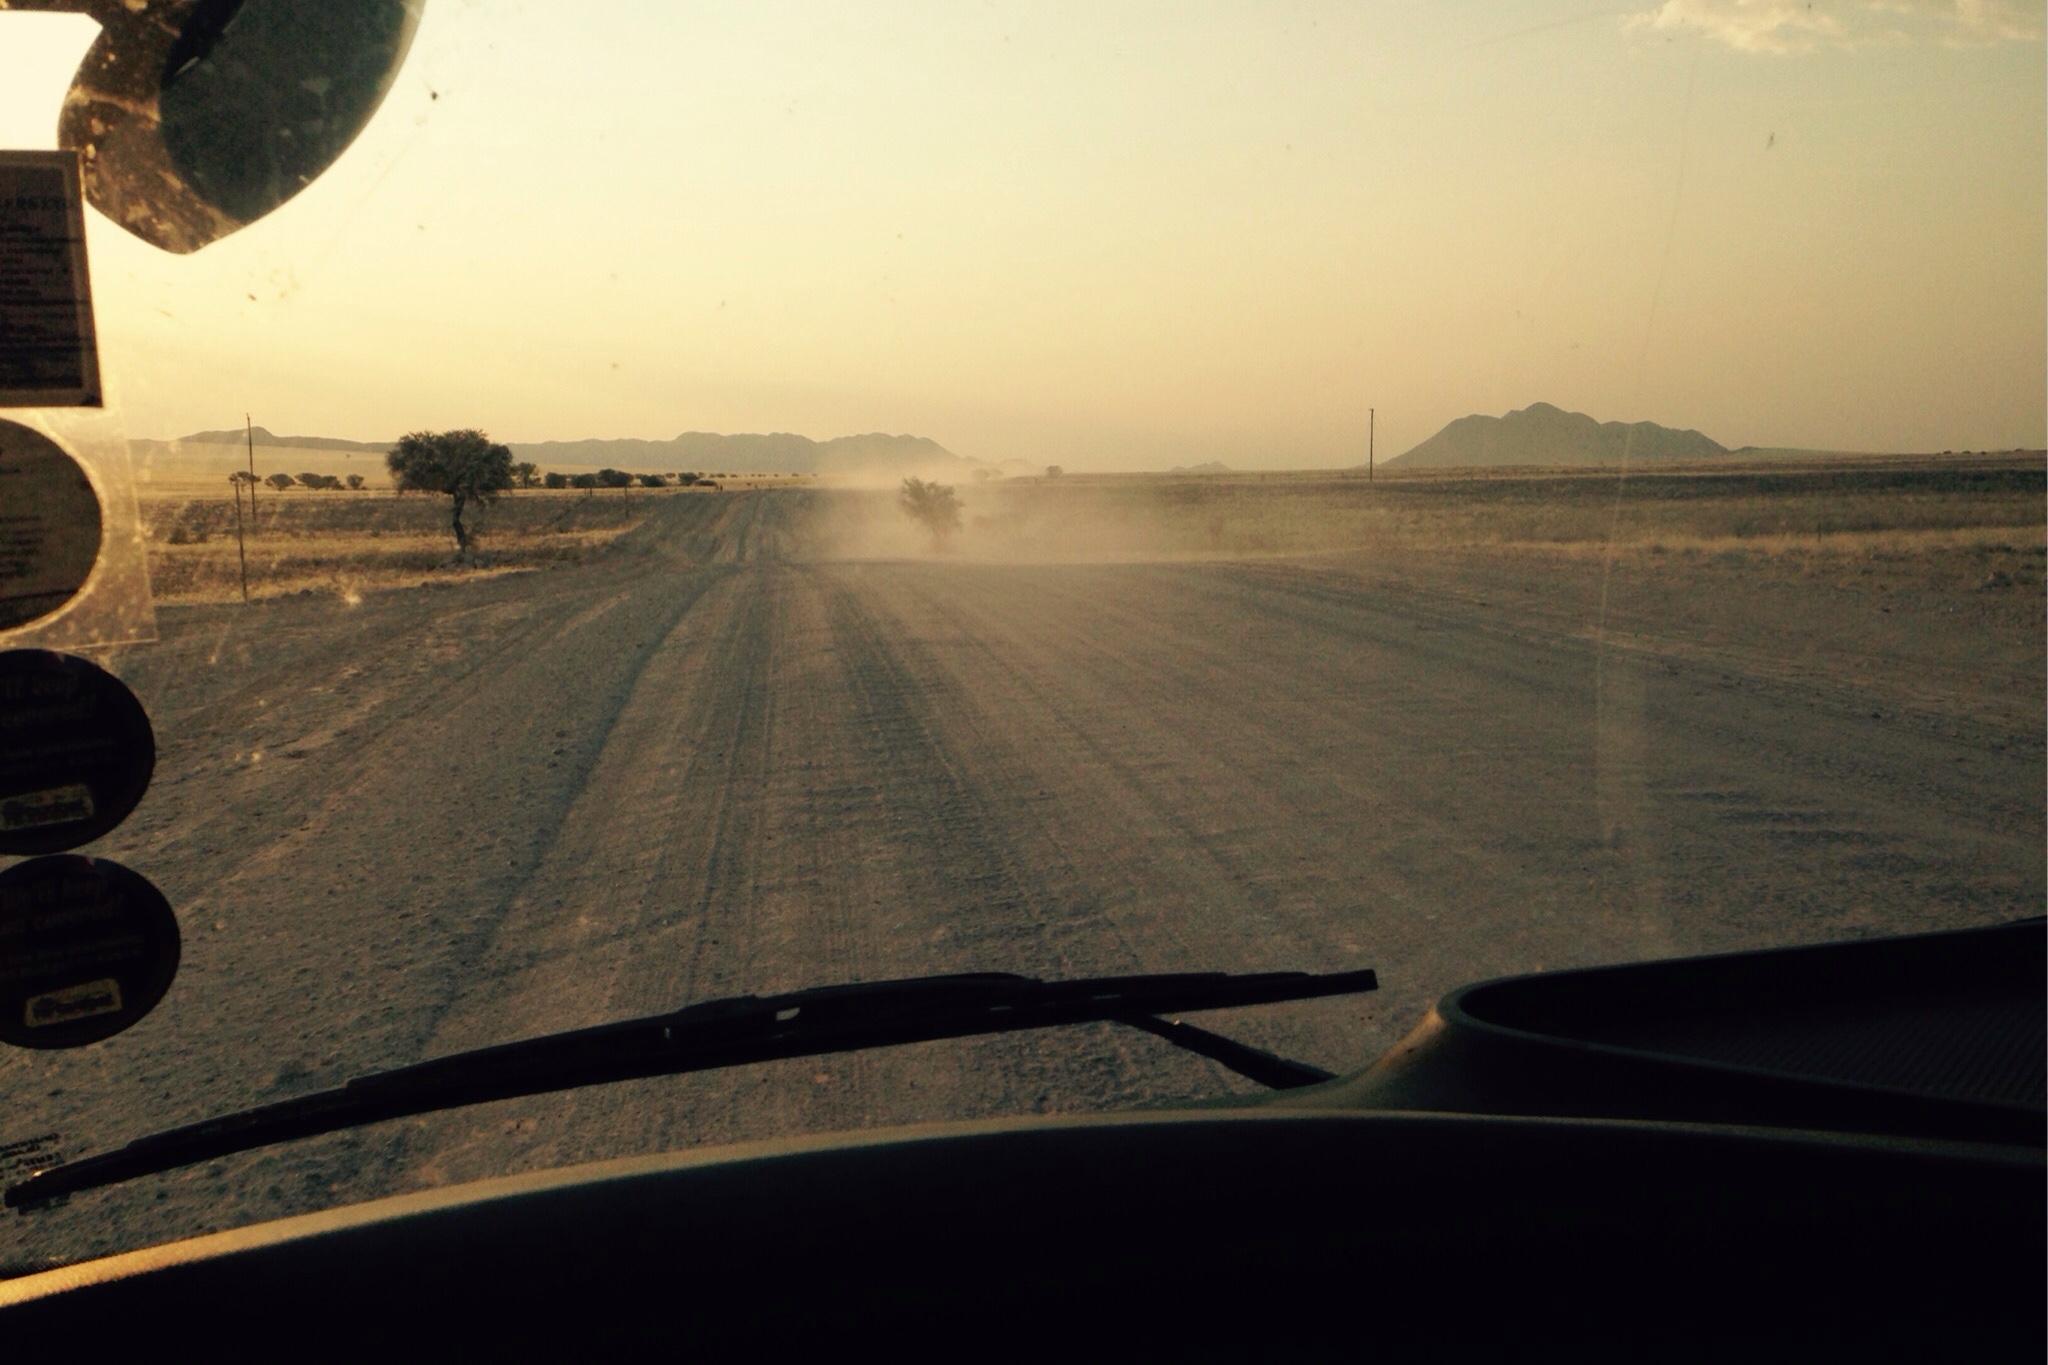 Namibia, Roadtrip, Overlanding, Afrika, G-Adventures